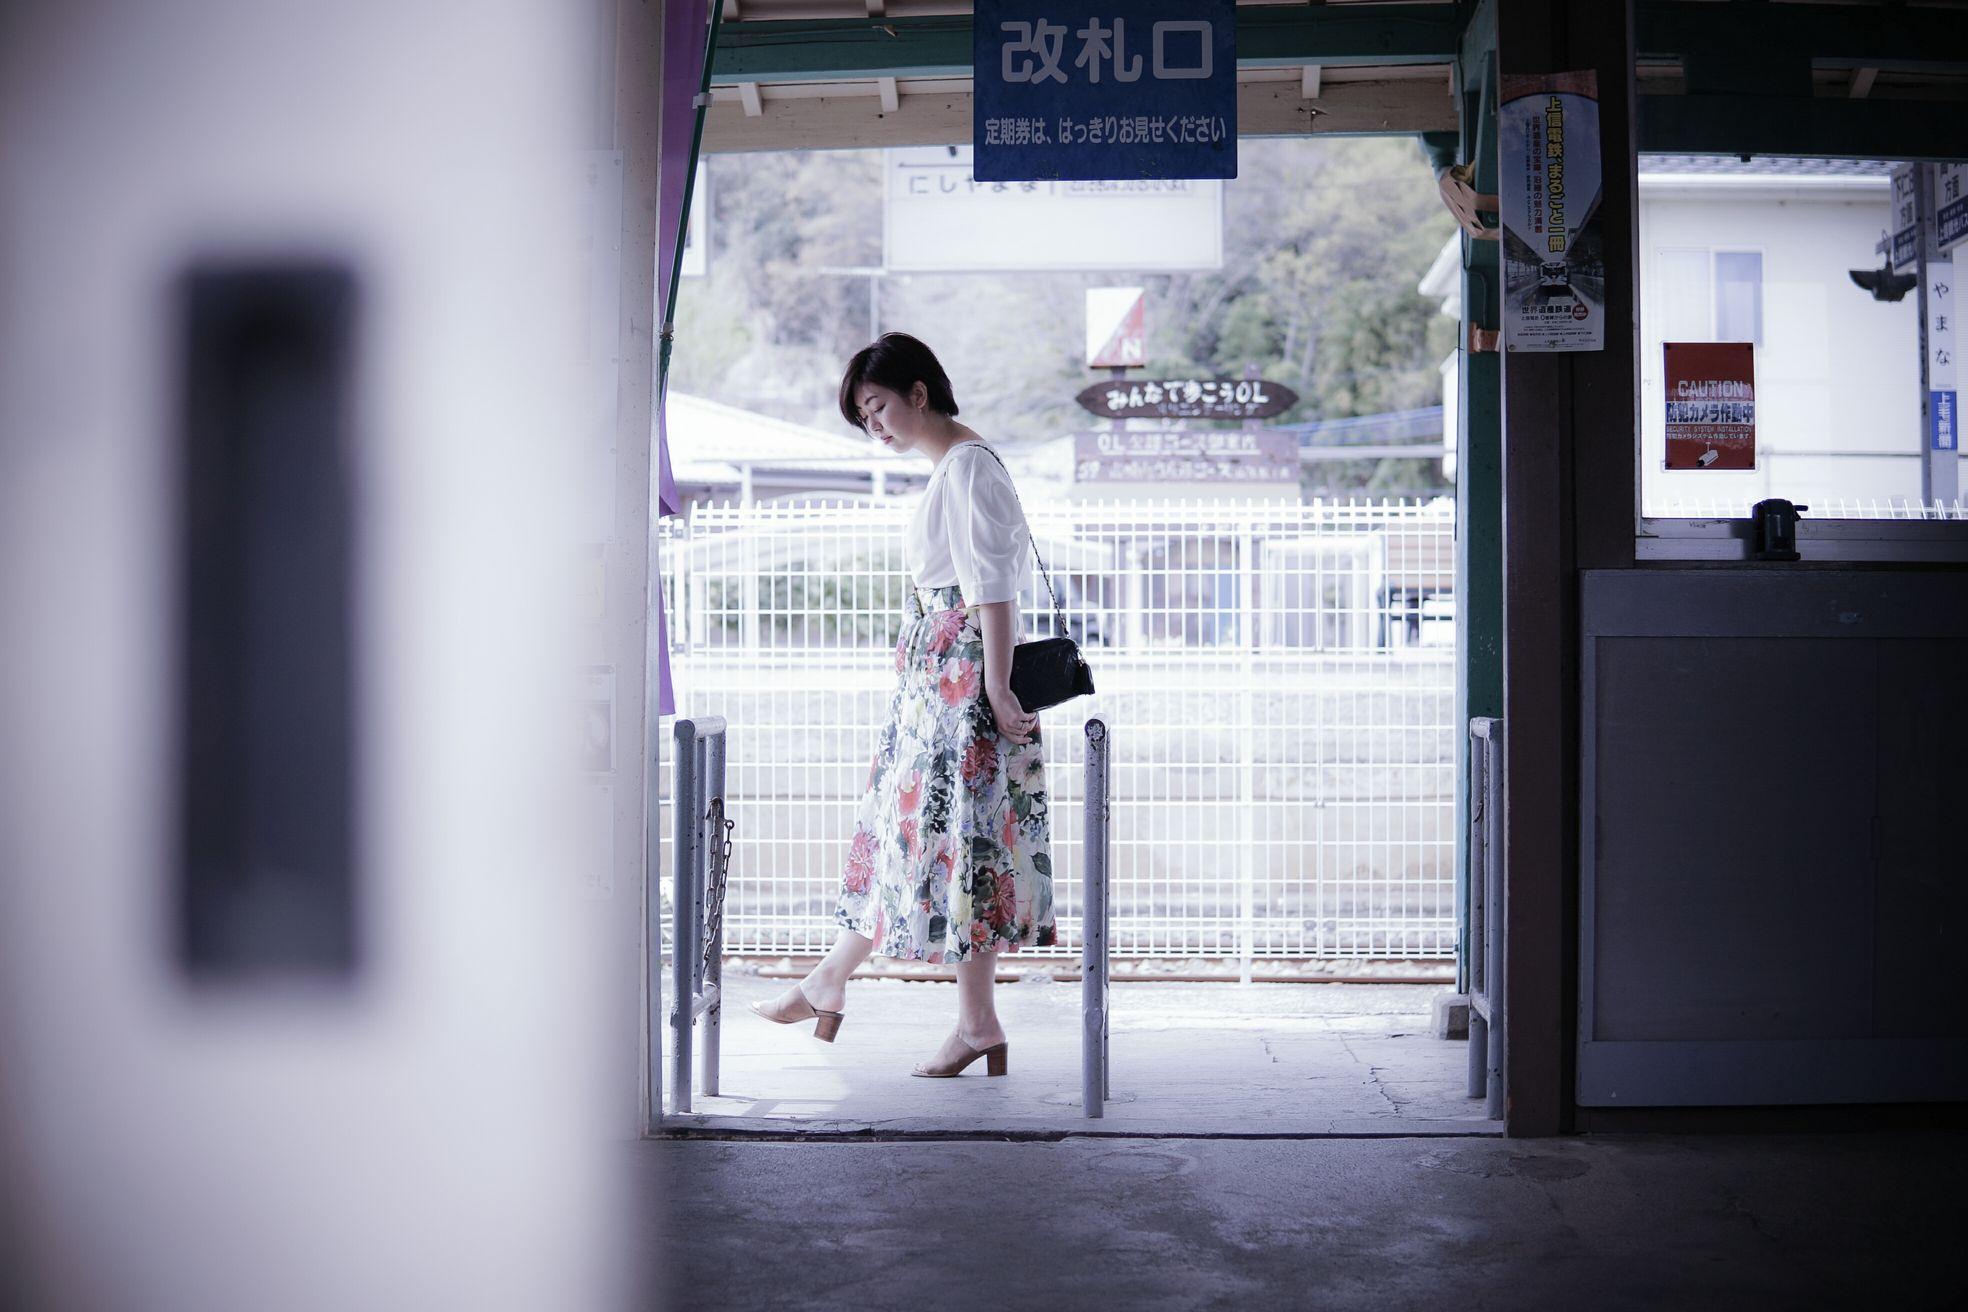 july,2020 ポートレート写真展「一期一会」in NADAR東京_d0231029_13442147.jpg